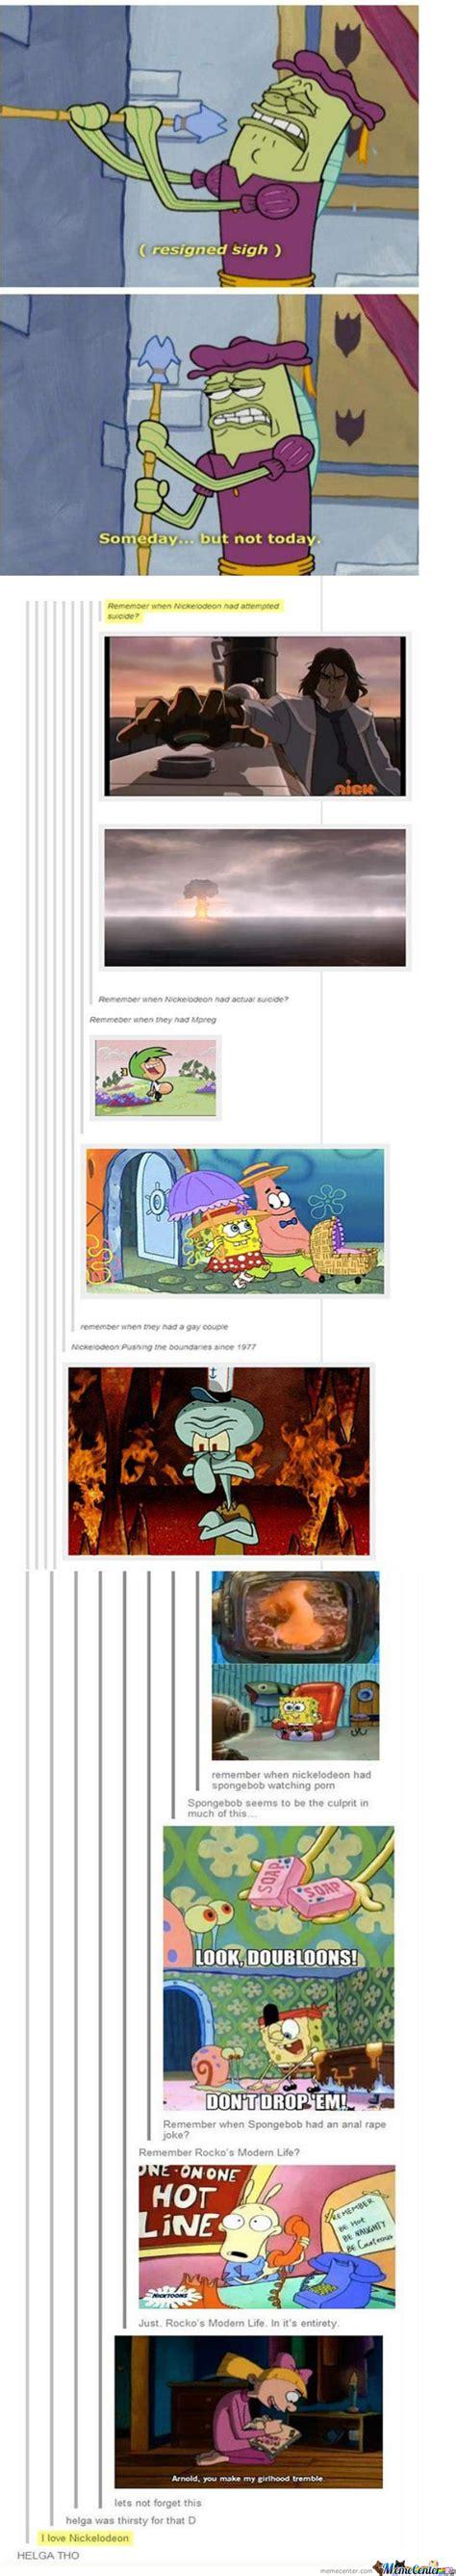 Nickelodeon Tumblr Nickelodeon Theatre Movie Times